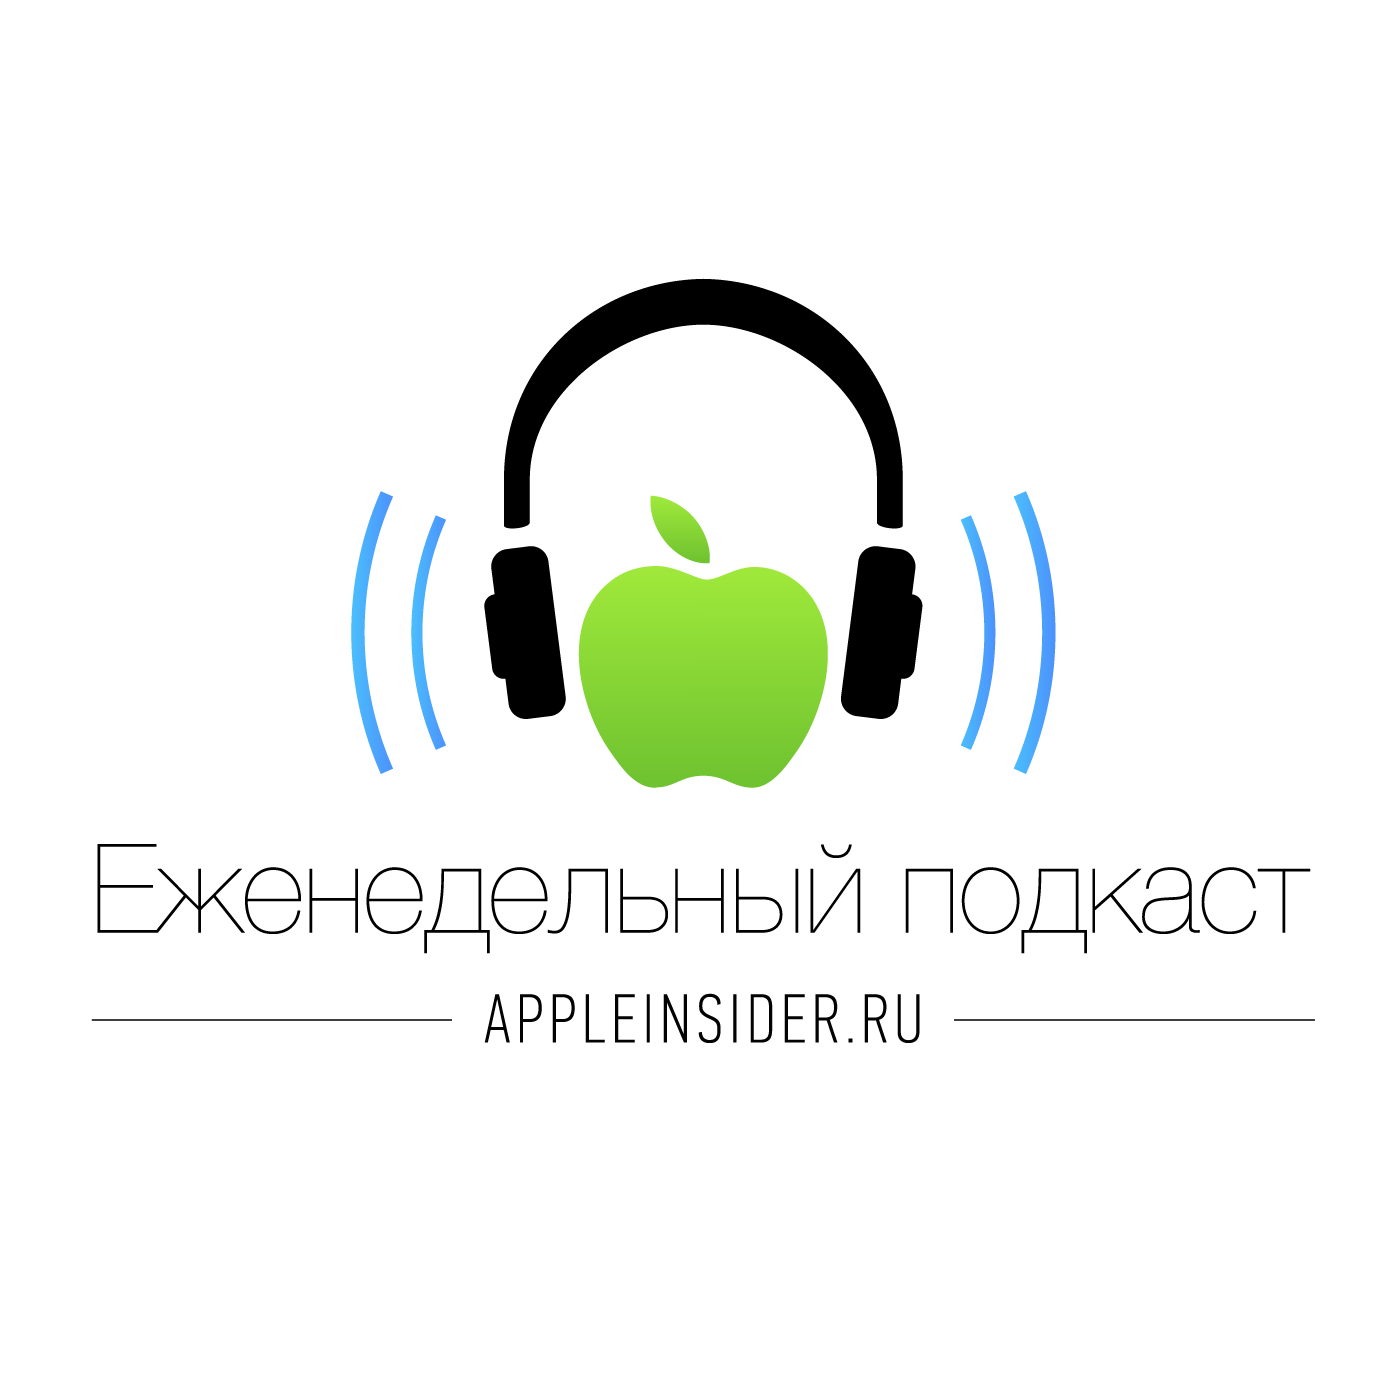 Миша Королев NOKIA 3310